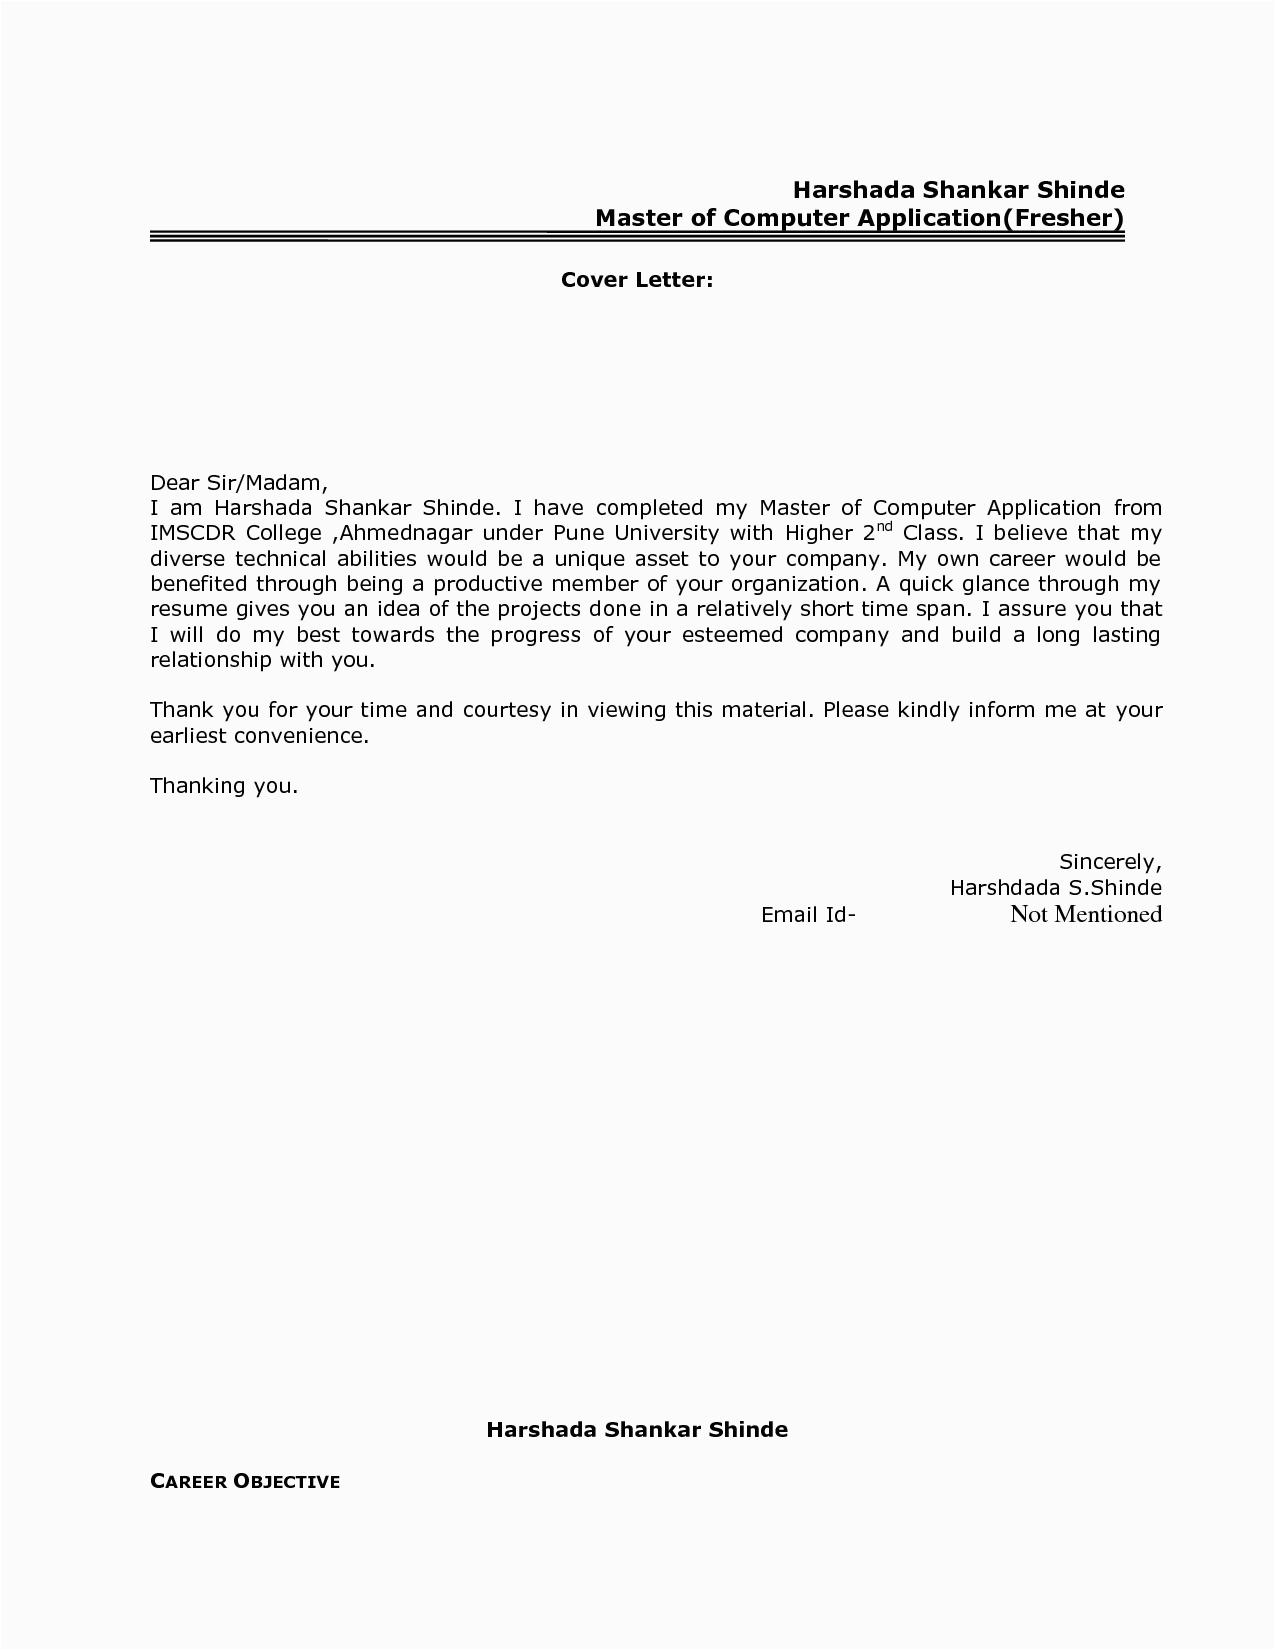 Sample Email to Send Resume for Job Fresher Best Resume Cover Letter format for Freshers Govt Jobcover